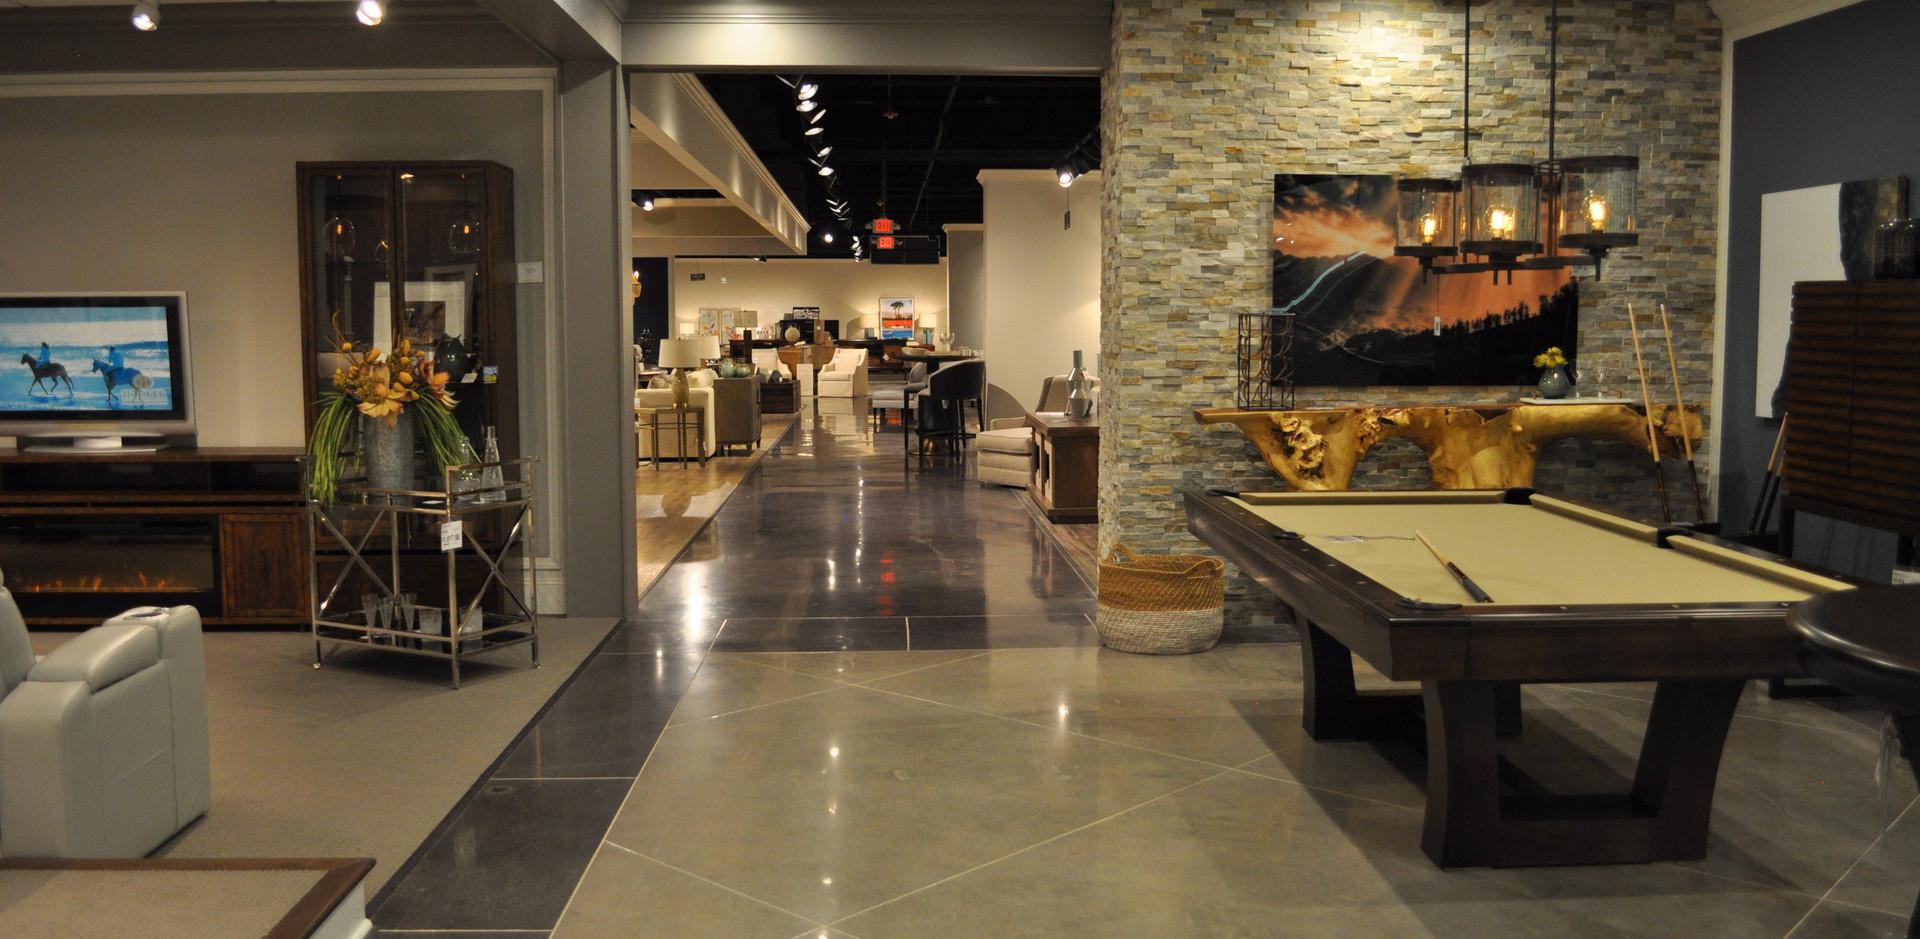 FurnitureLand South, Showroom 8